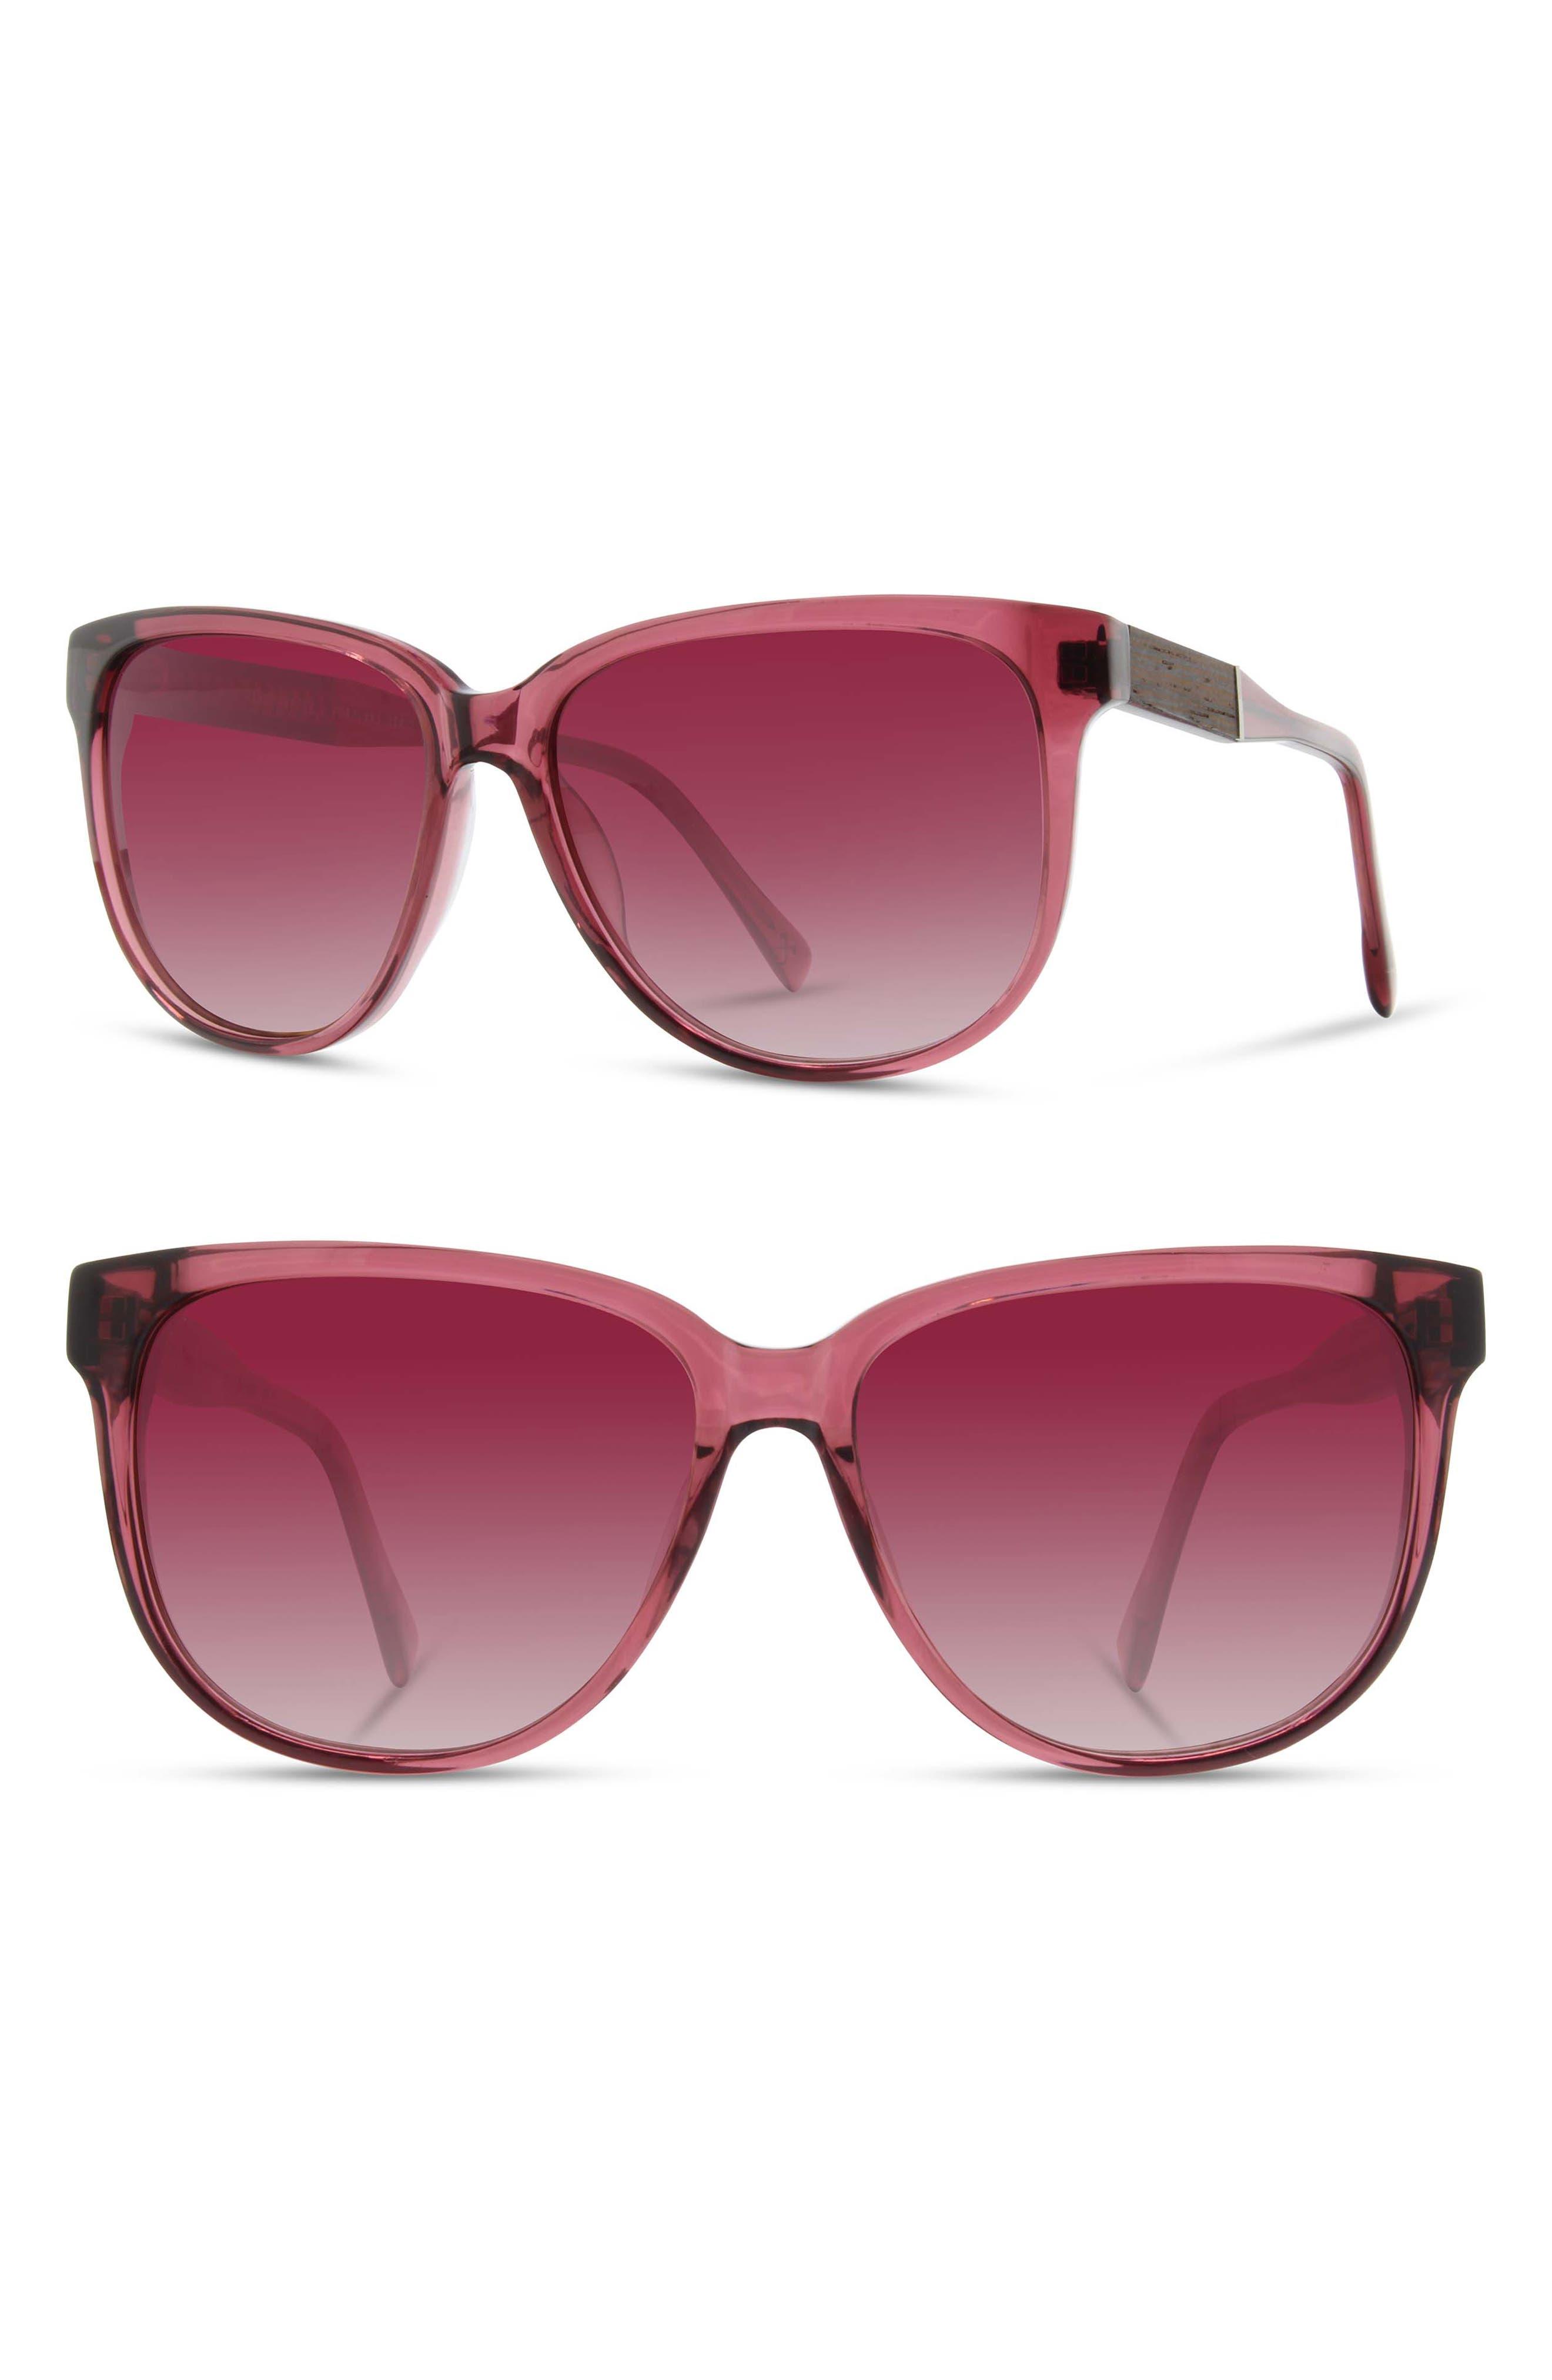 SHWOOD 'Mckenzie' 57Mm Retro Sunglasses - Blossom/ Ebony/ Brown